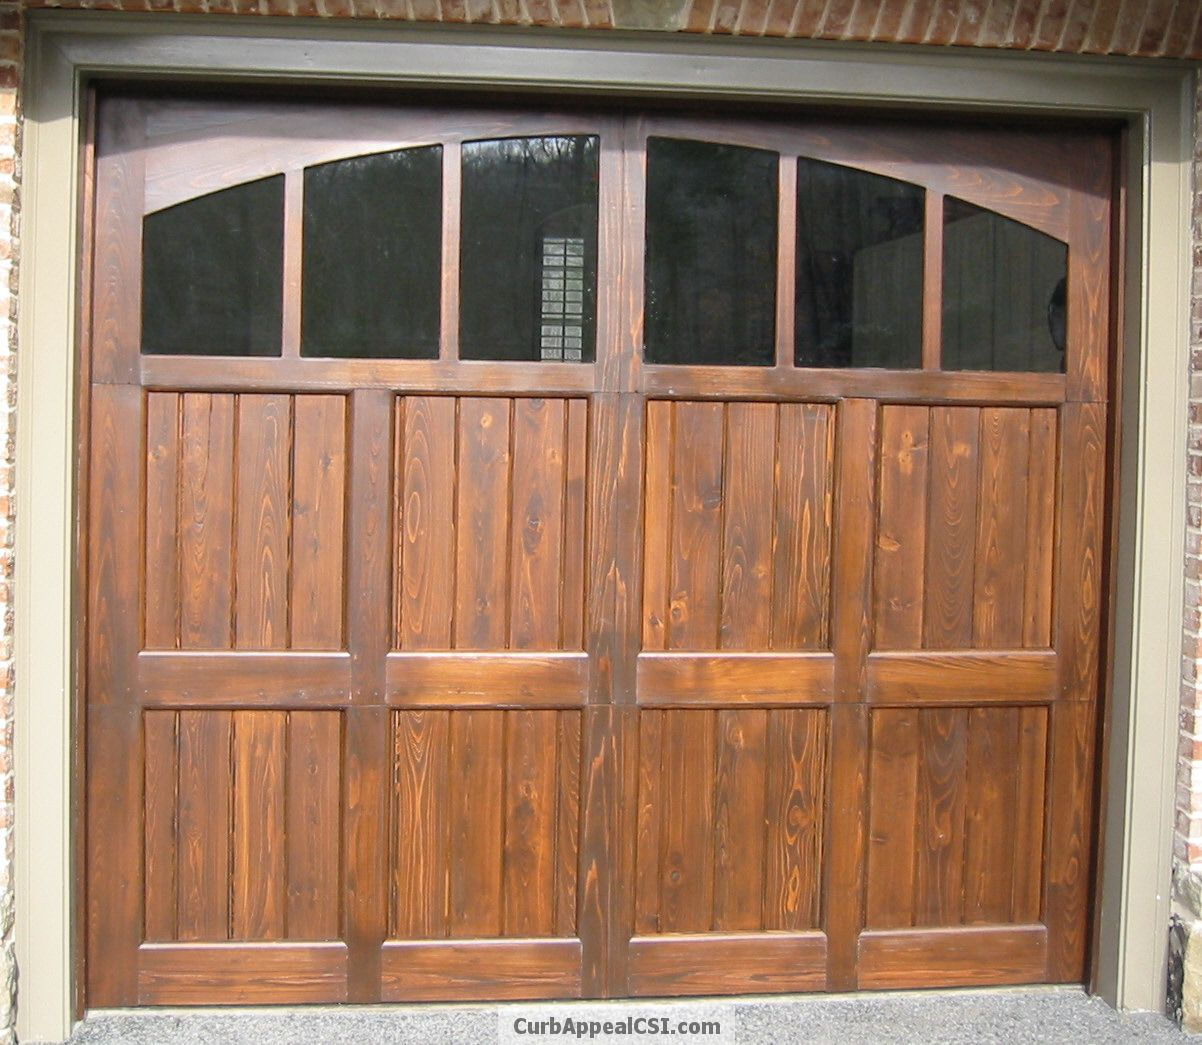 Carriage style garage doors cost - Images Of Garage Doors Pictures Of Garage Doors Installed In The Metro Atlanta Area